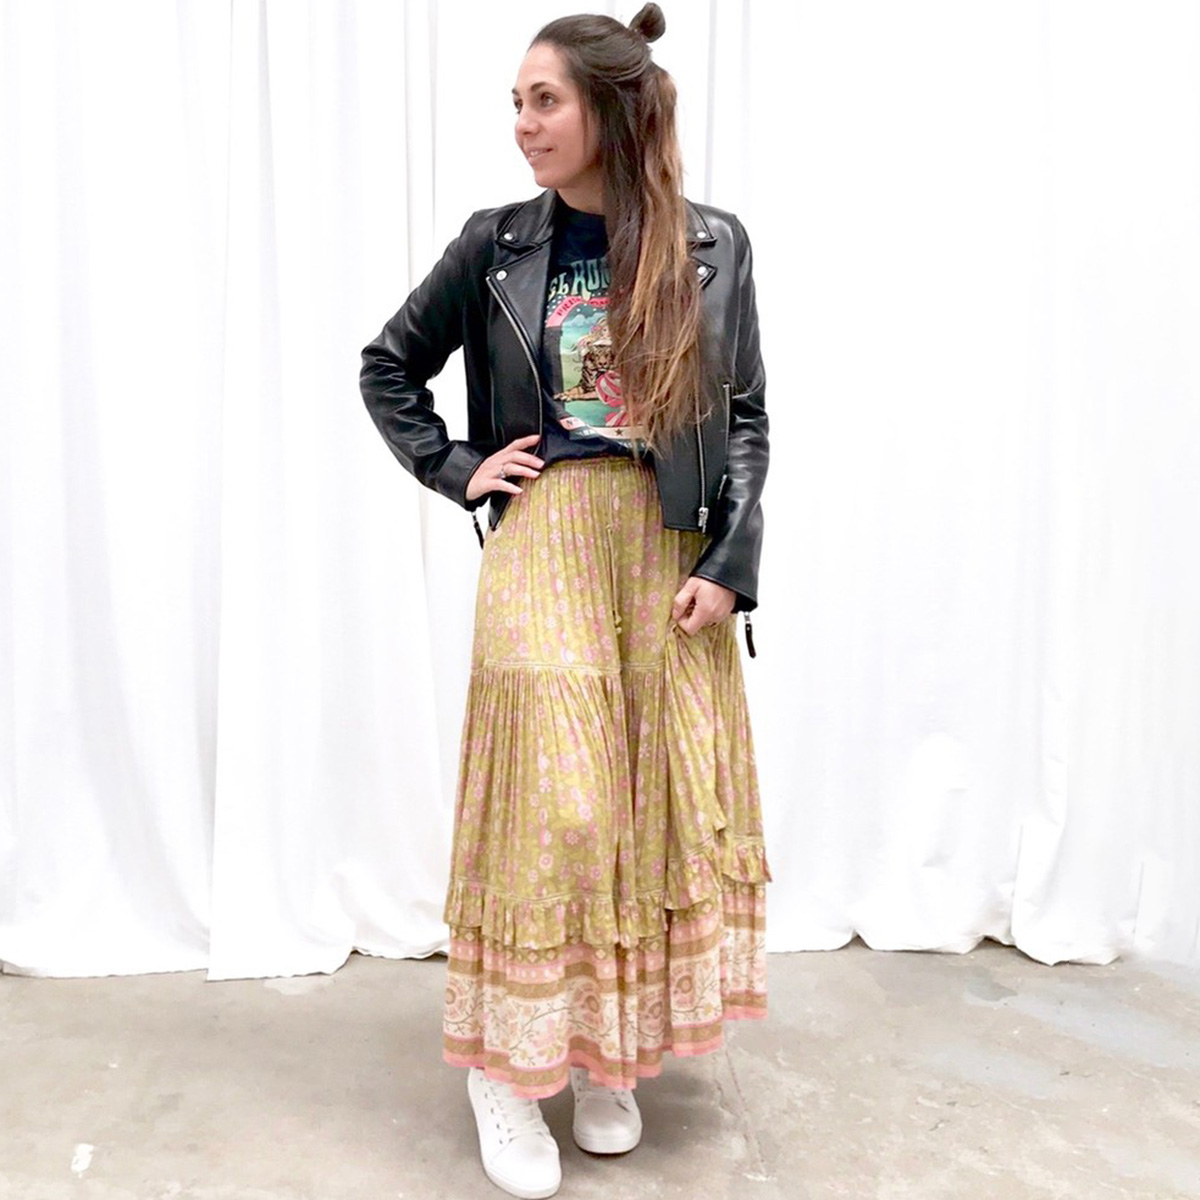 Jastie Dahlia Maxi Skirt Women Three Tiers Hem Hippie Chic Boho Skirts Beach Faldas Mujer Moda 2019 Autumn Skirt Saia Jupe Femme